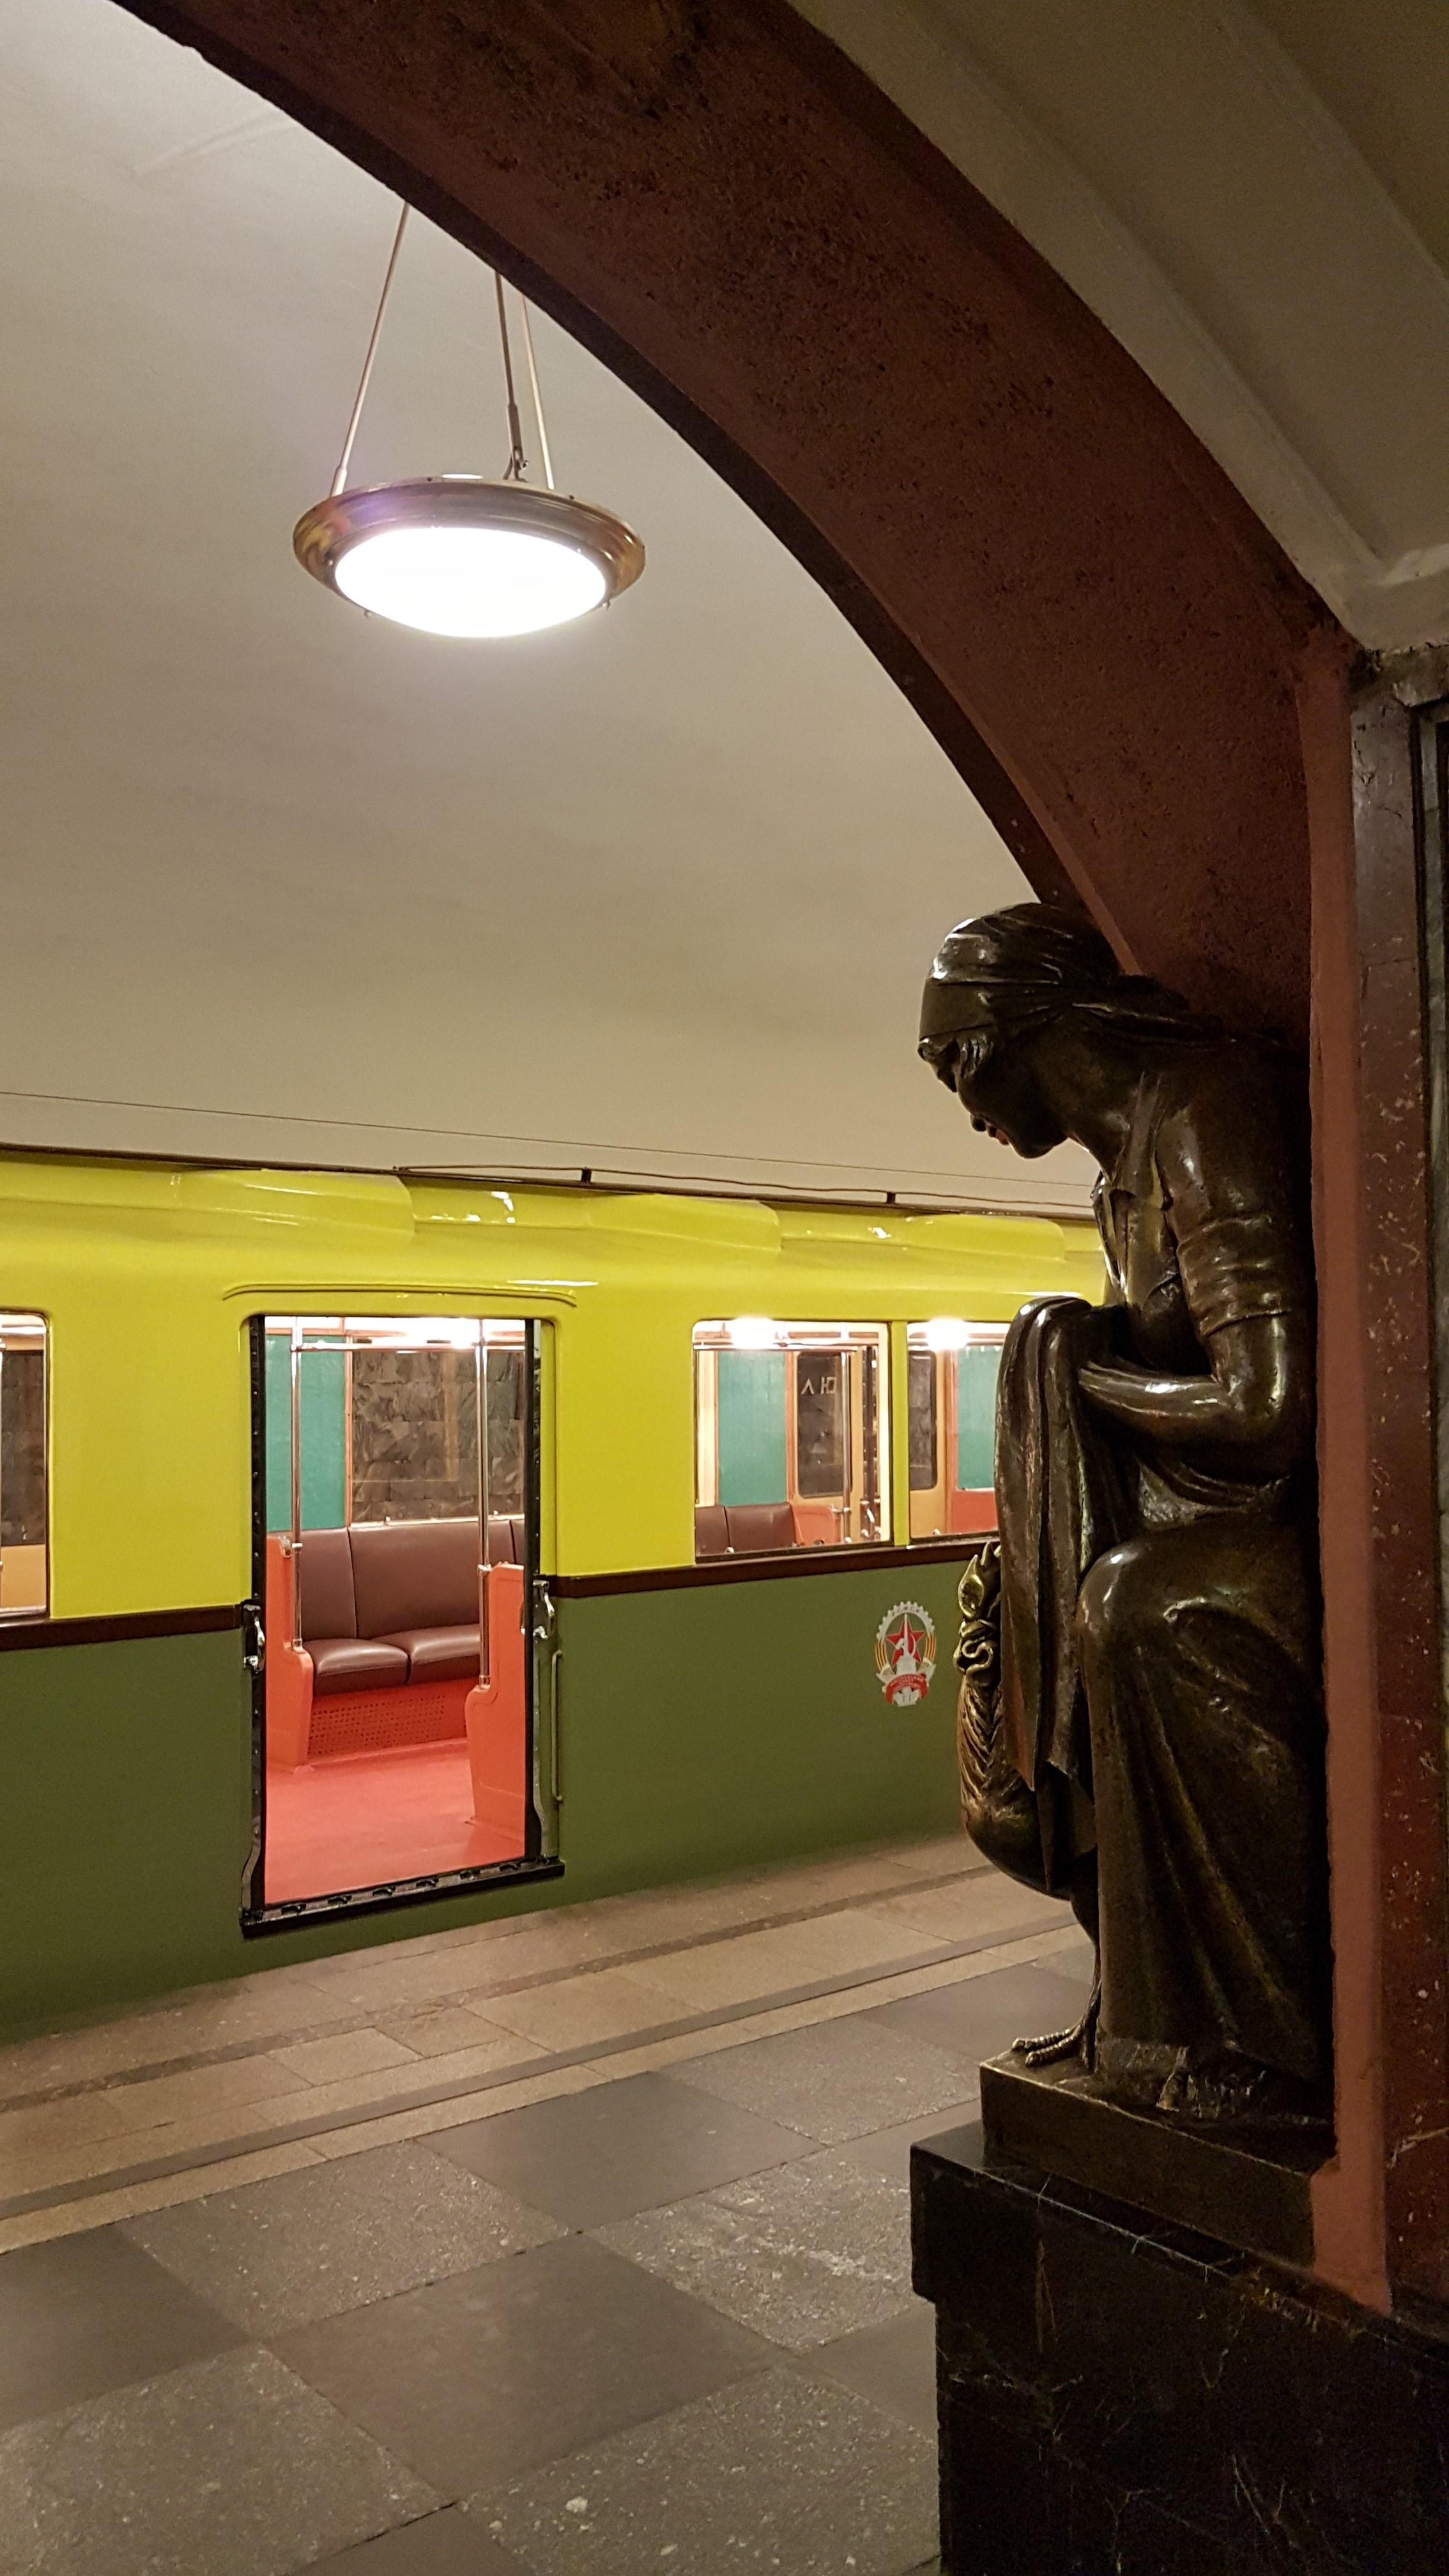 iconic metro stations Ploschad Revolutsii